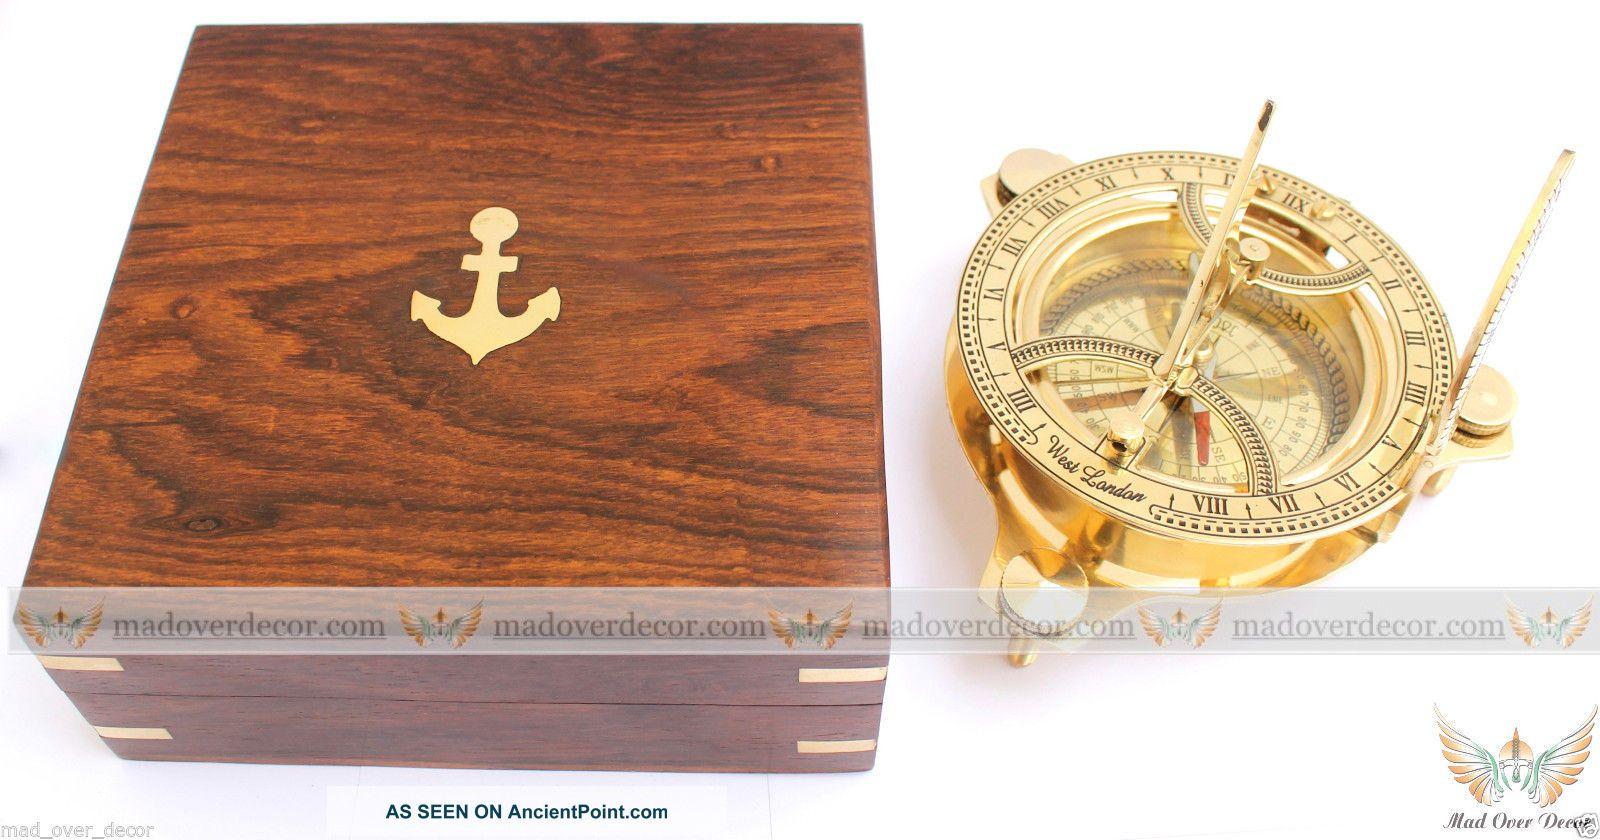 Antique Vintage Maritime Brass Circular Sundial Compass 4